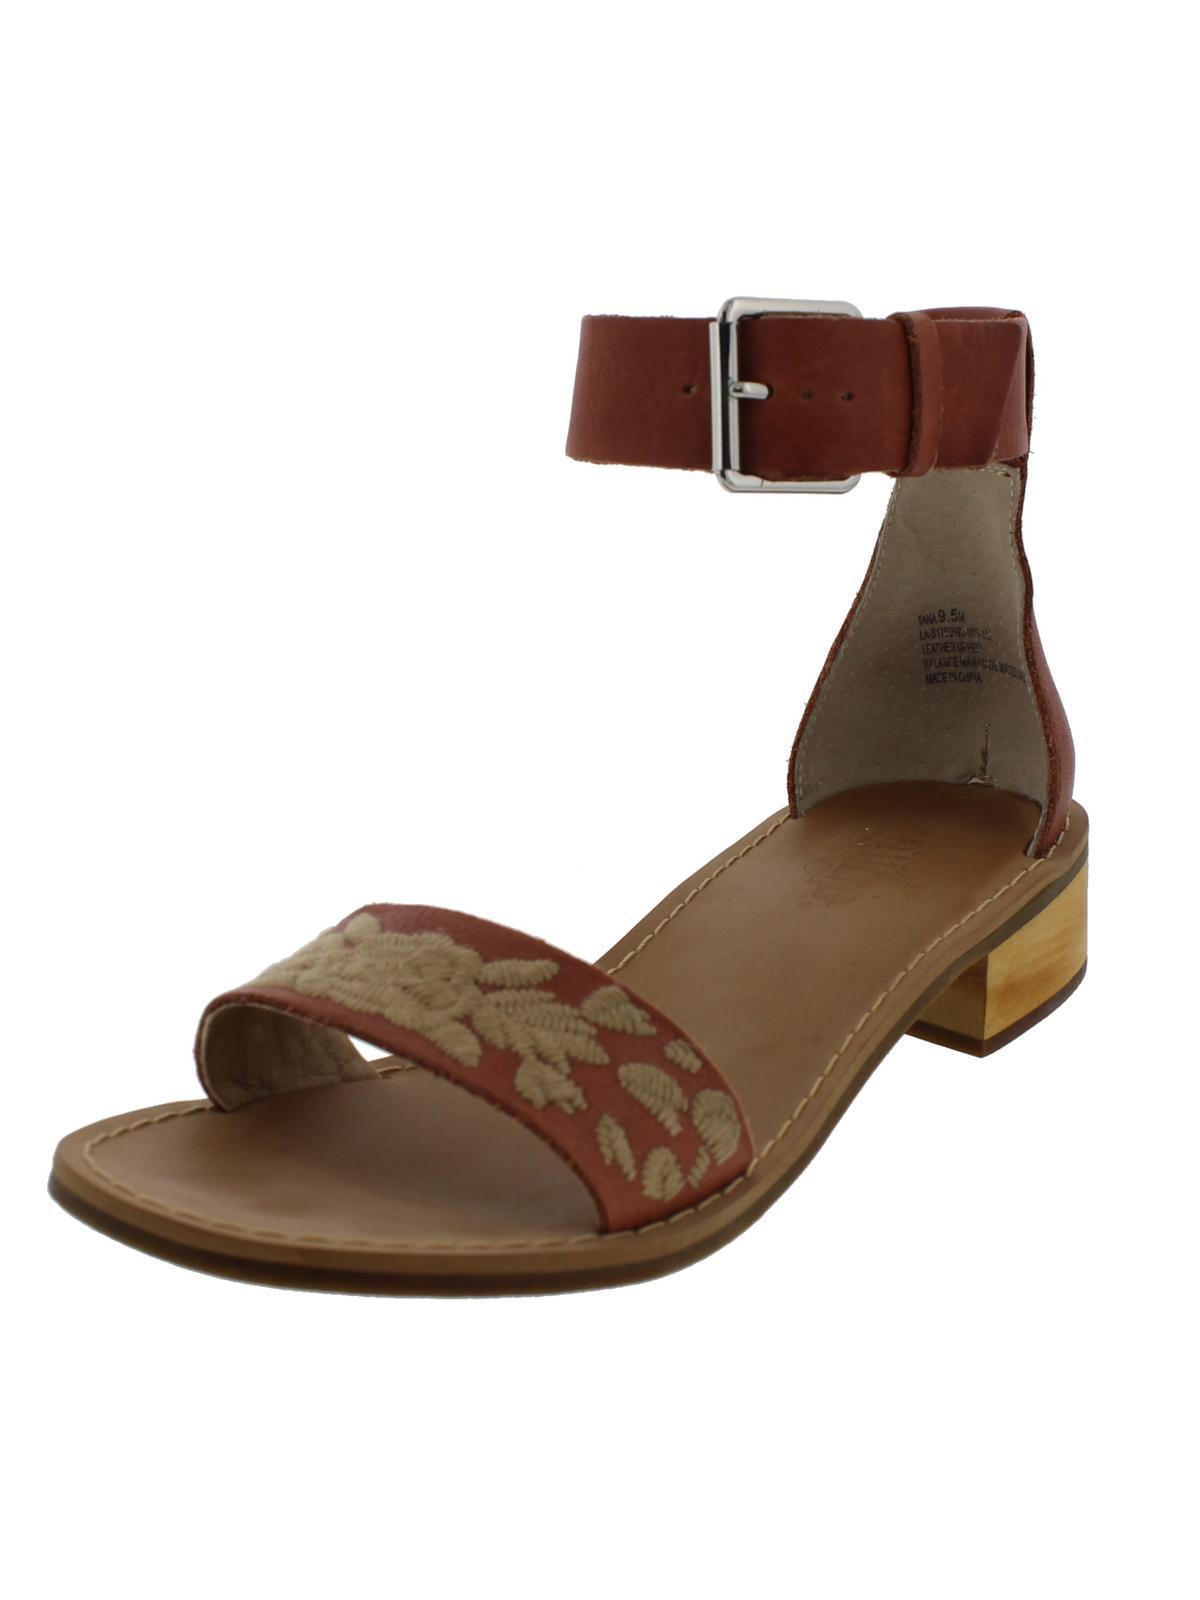 Latigo Womens Tana Leather Block Heel Dress Sandals Brown 9.5 Medium (B,M)